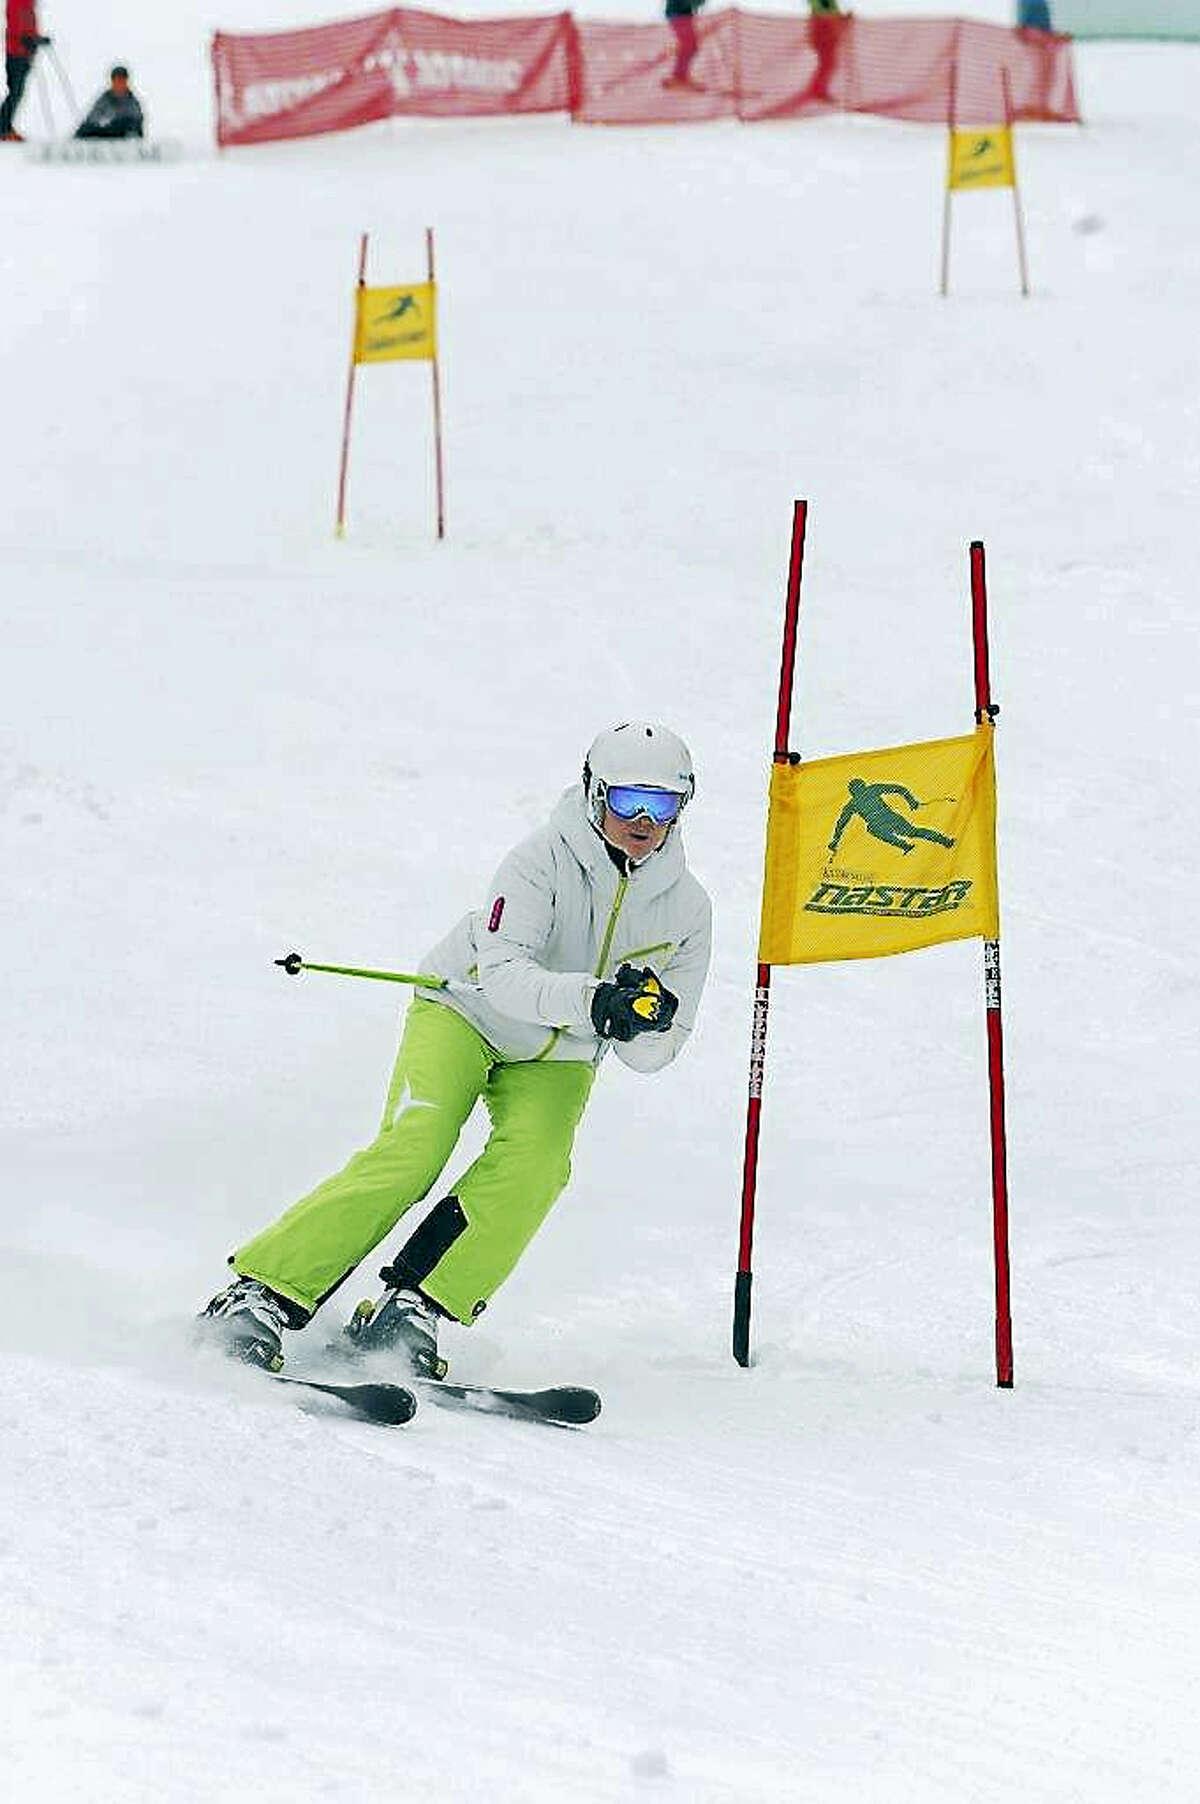 Photo courtesy of Ski SundownSkiing season equals plenty of action, including races, down the mountain in Salisbury.